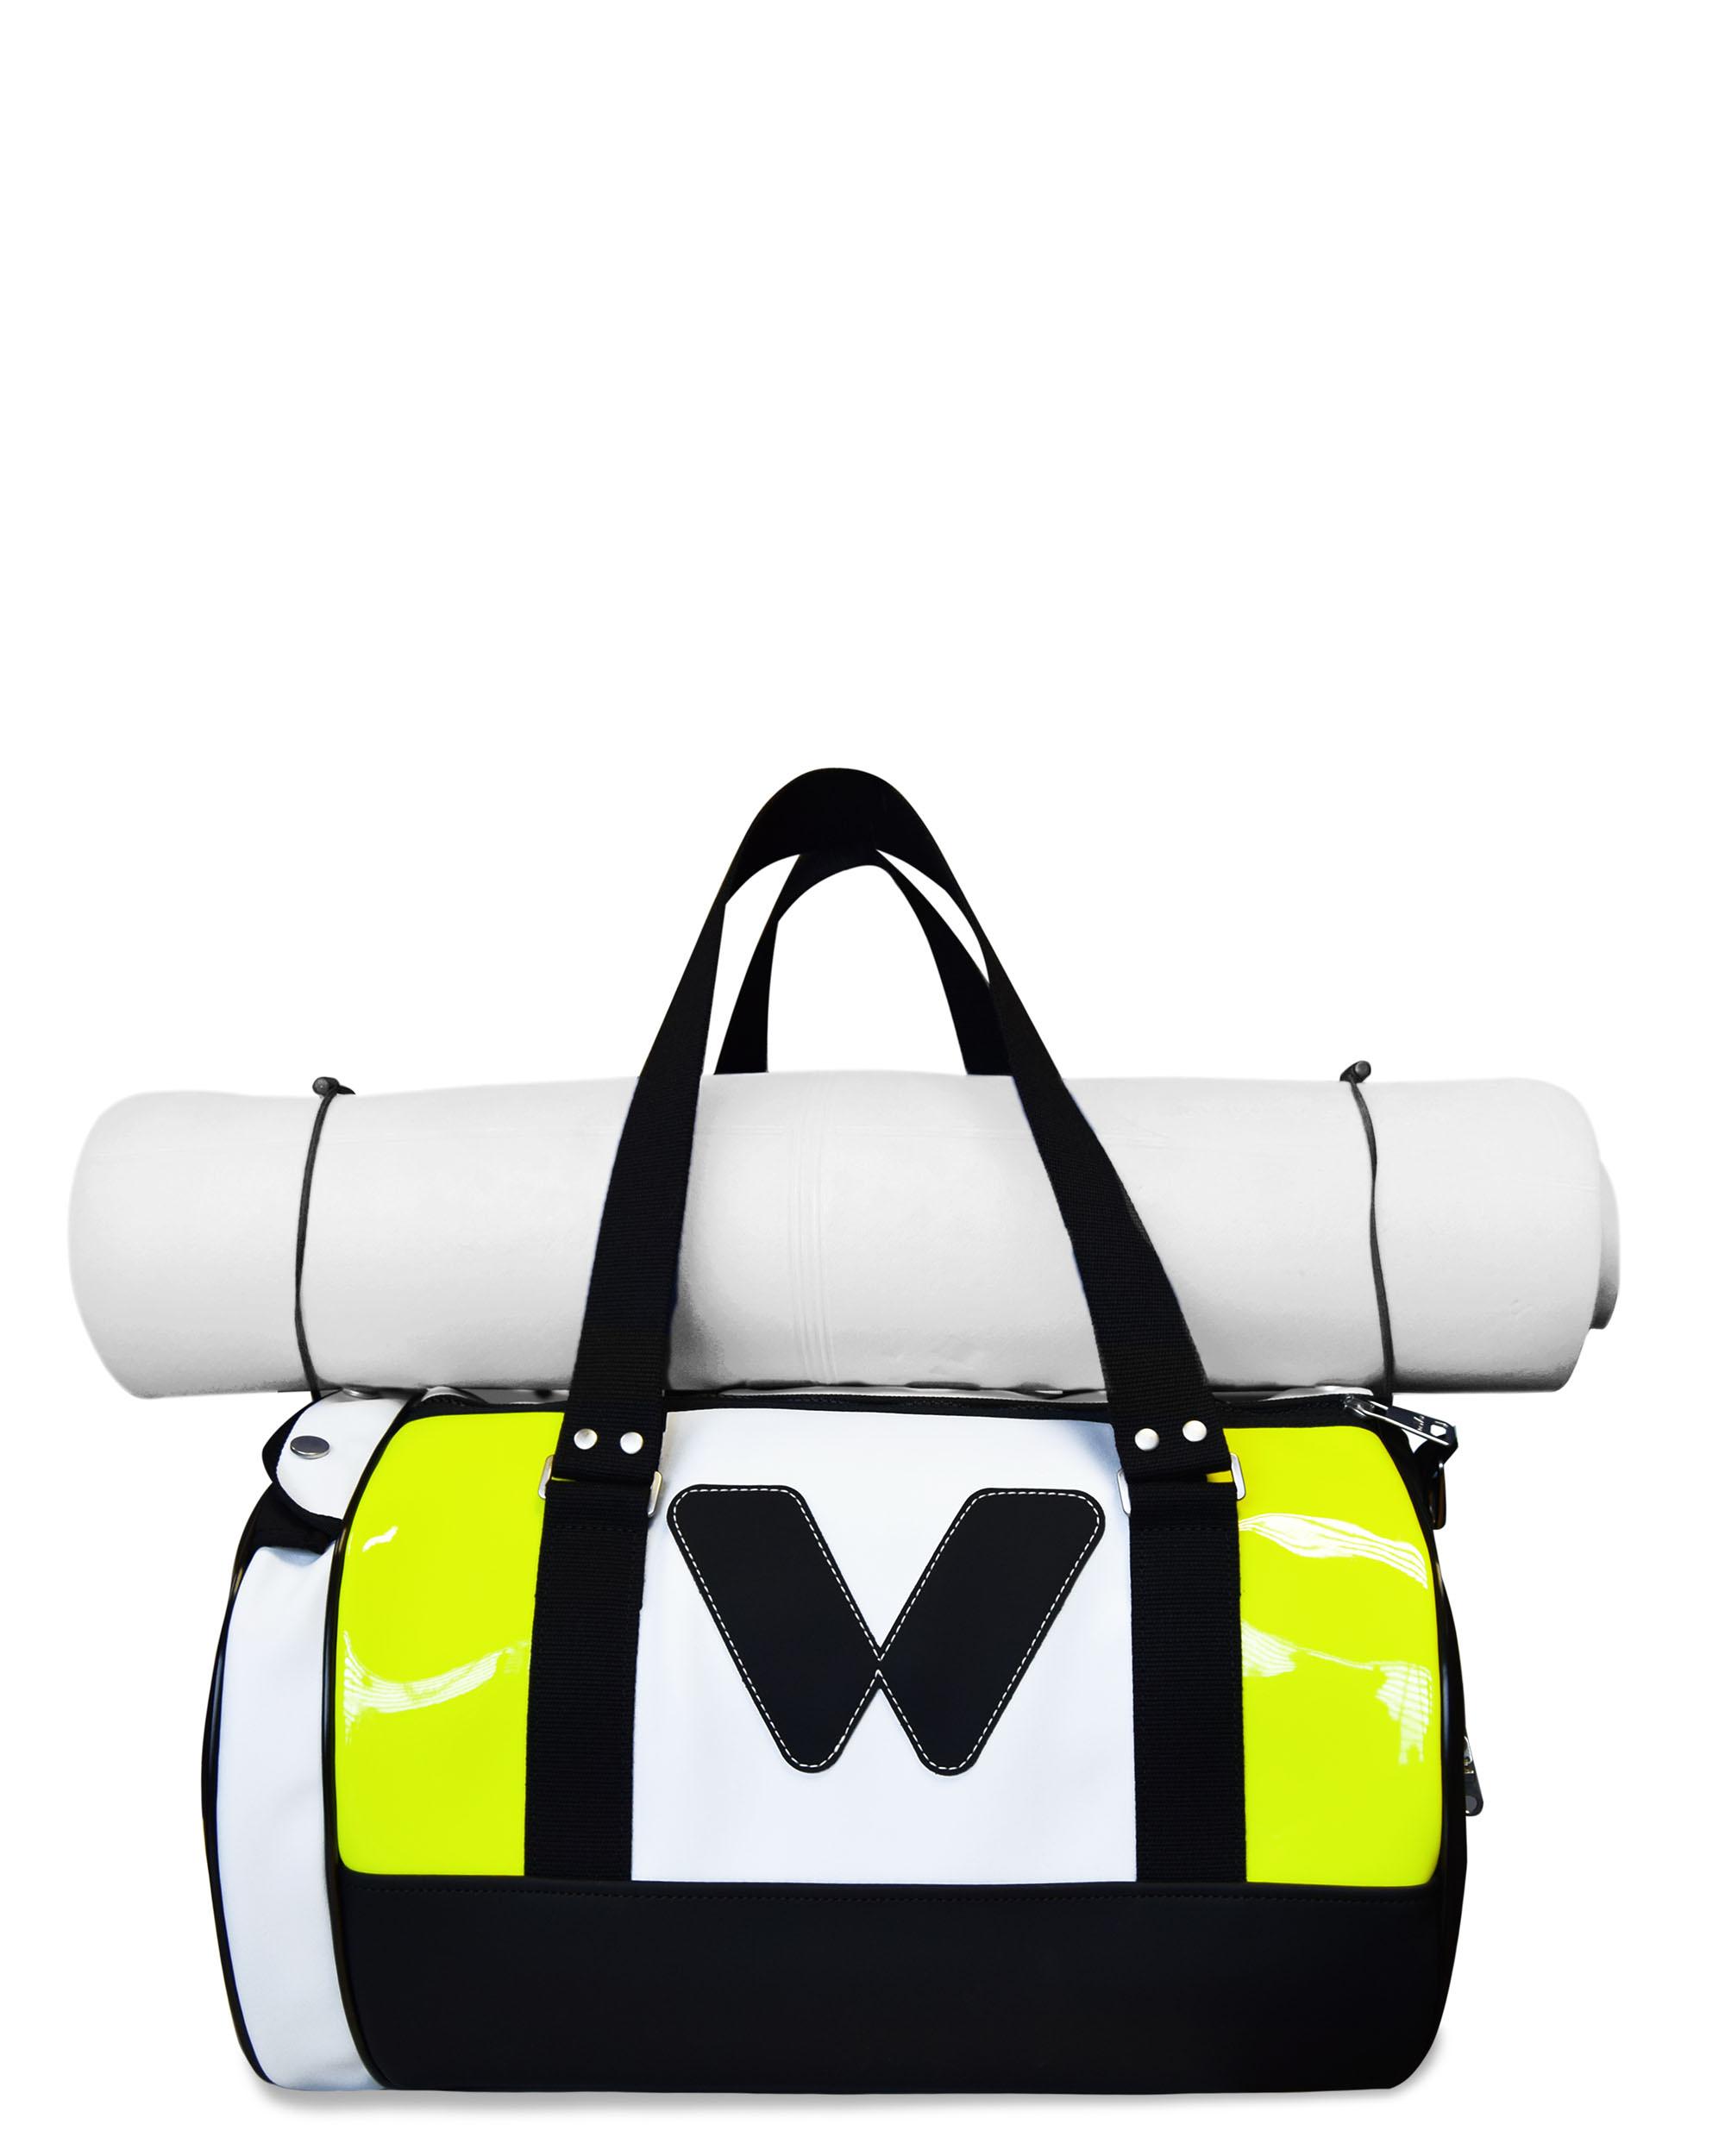 6ebfc5fa8caf YOGA BAG UNISEX NEON Yoga bag. Take your yoga or pilates mat in